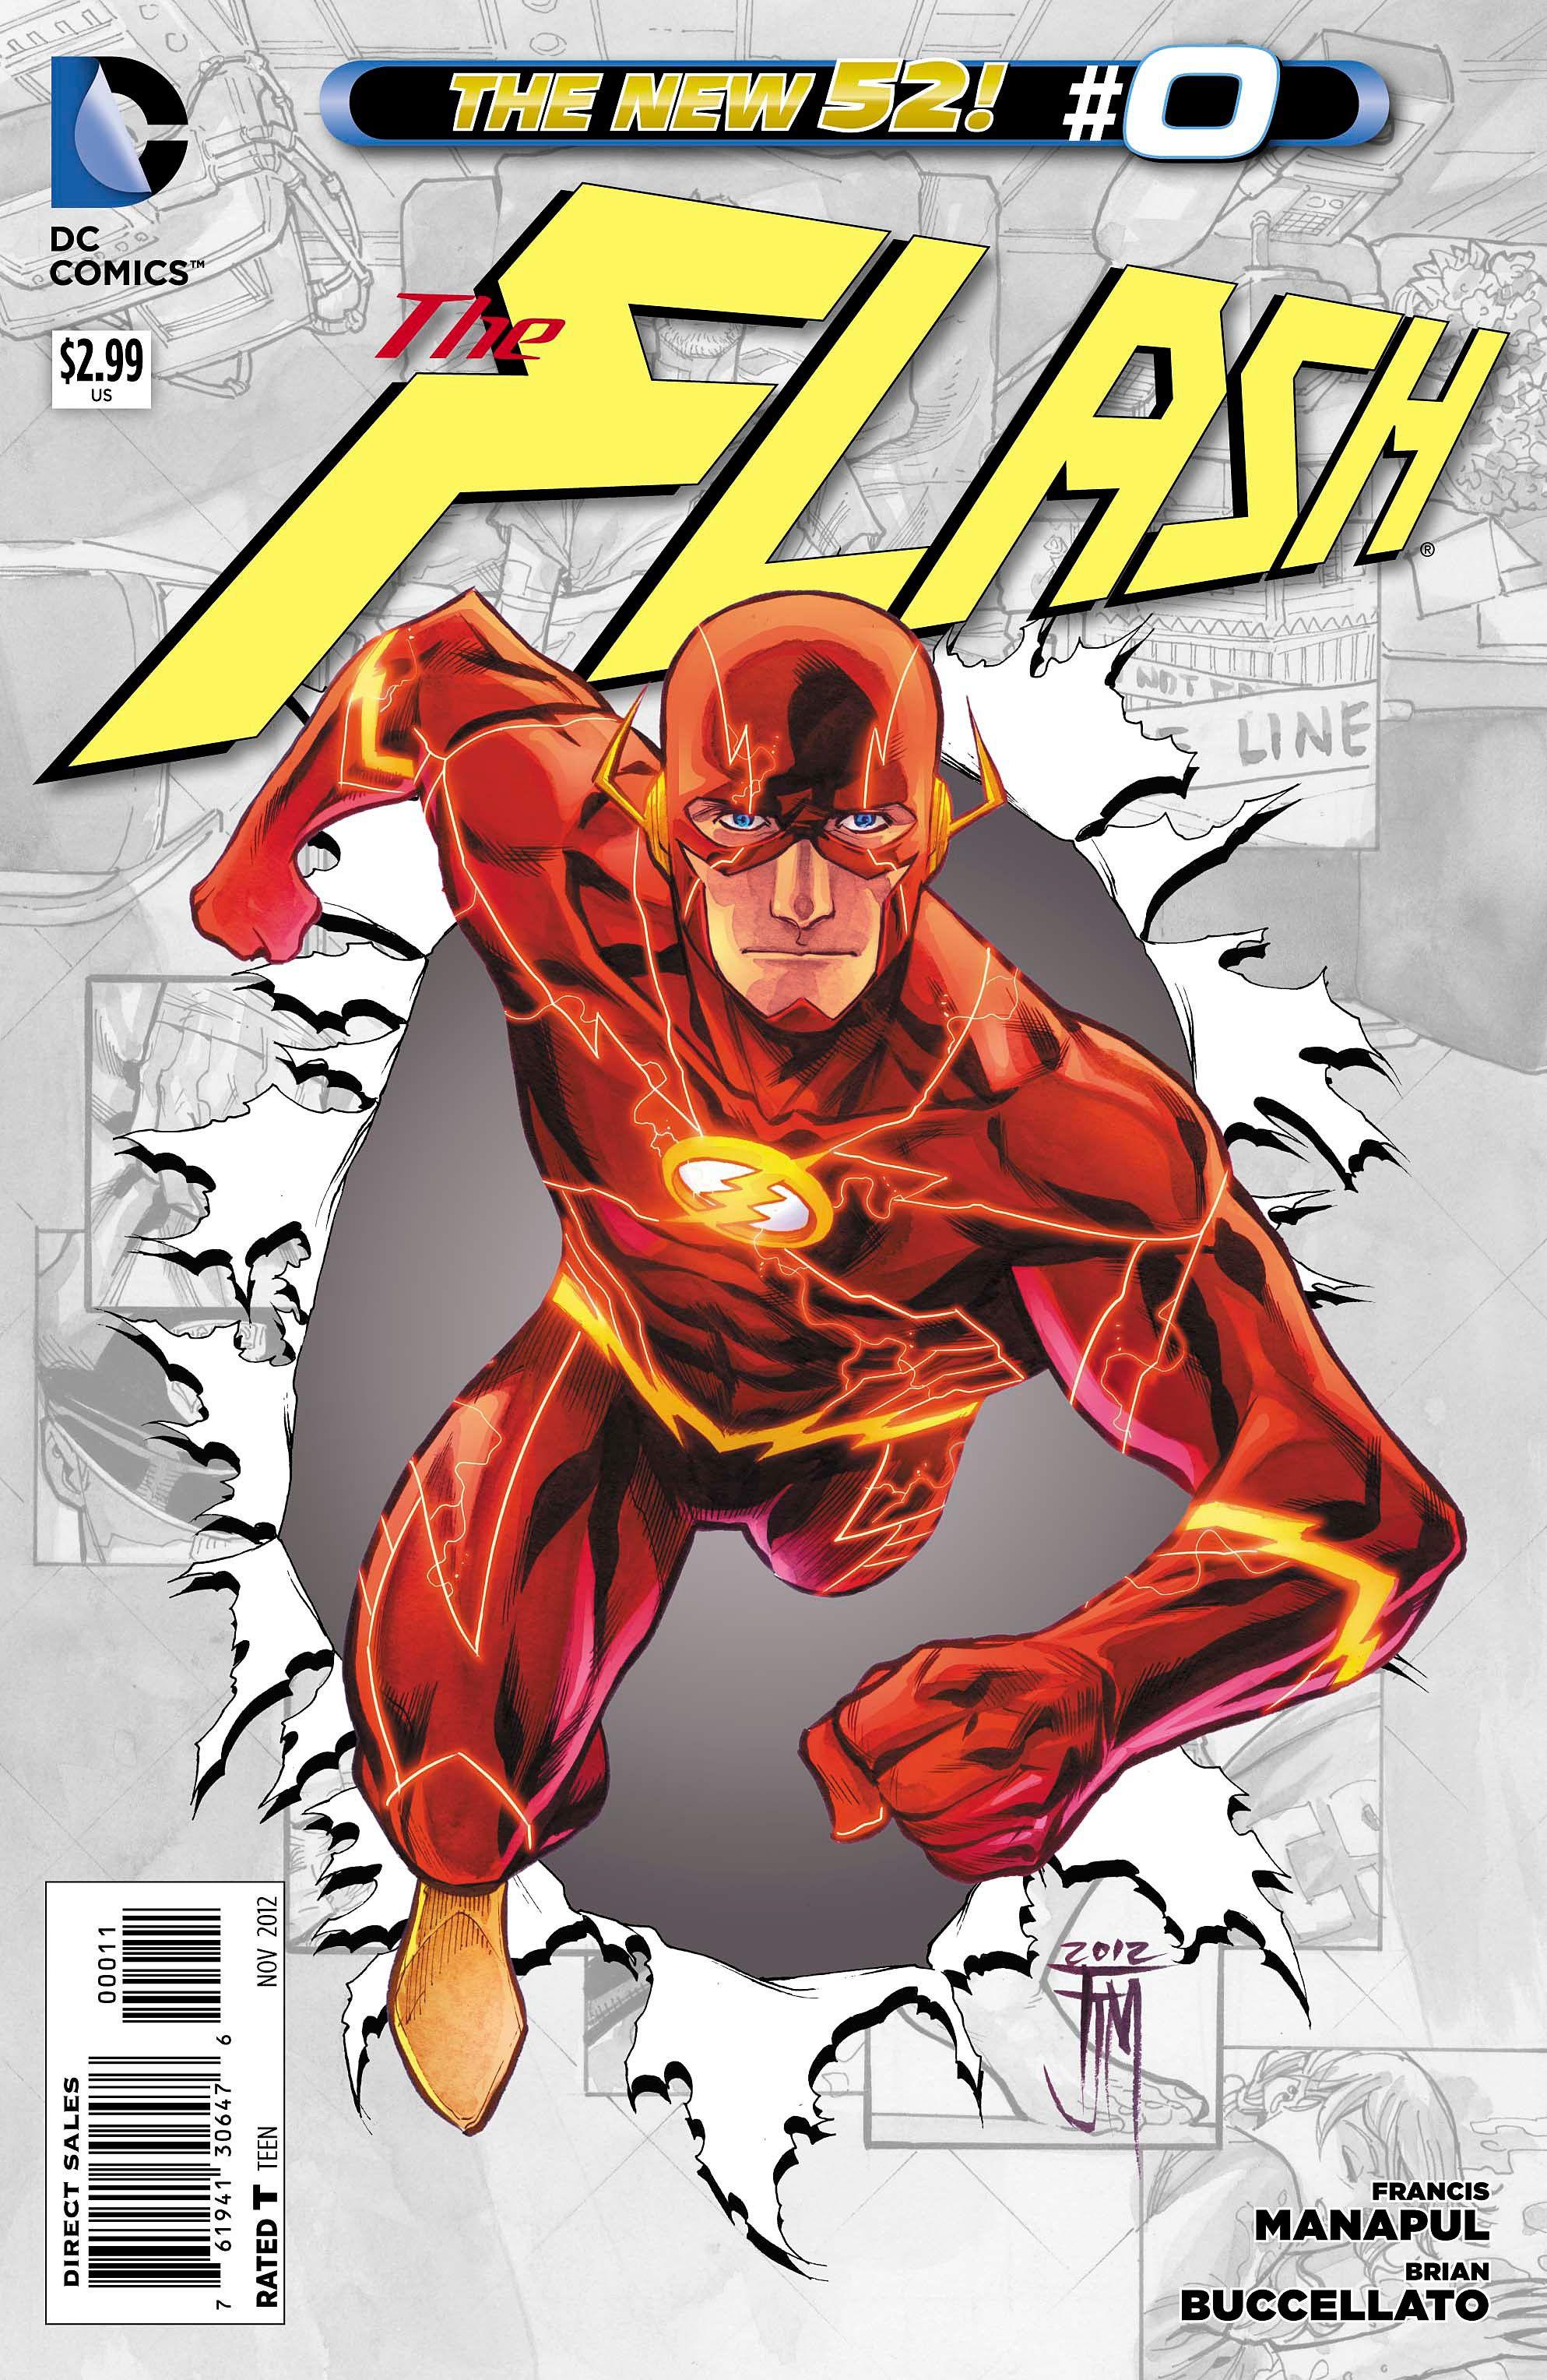 http://comics-x-aminer.com/2012/09/26/preview-the-flash-0/